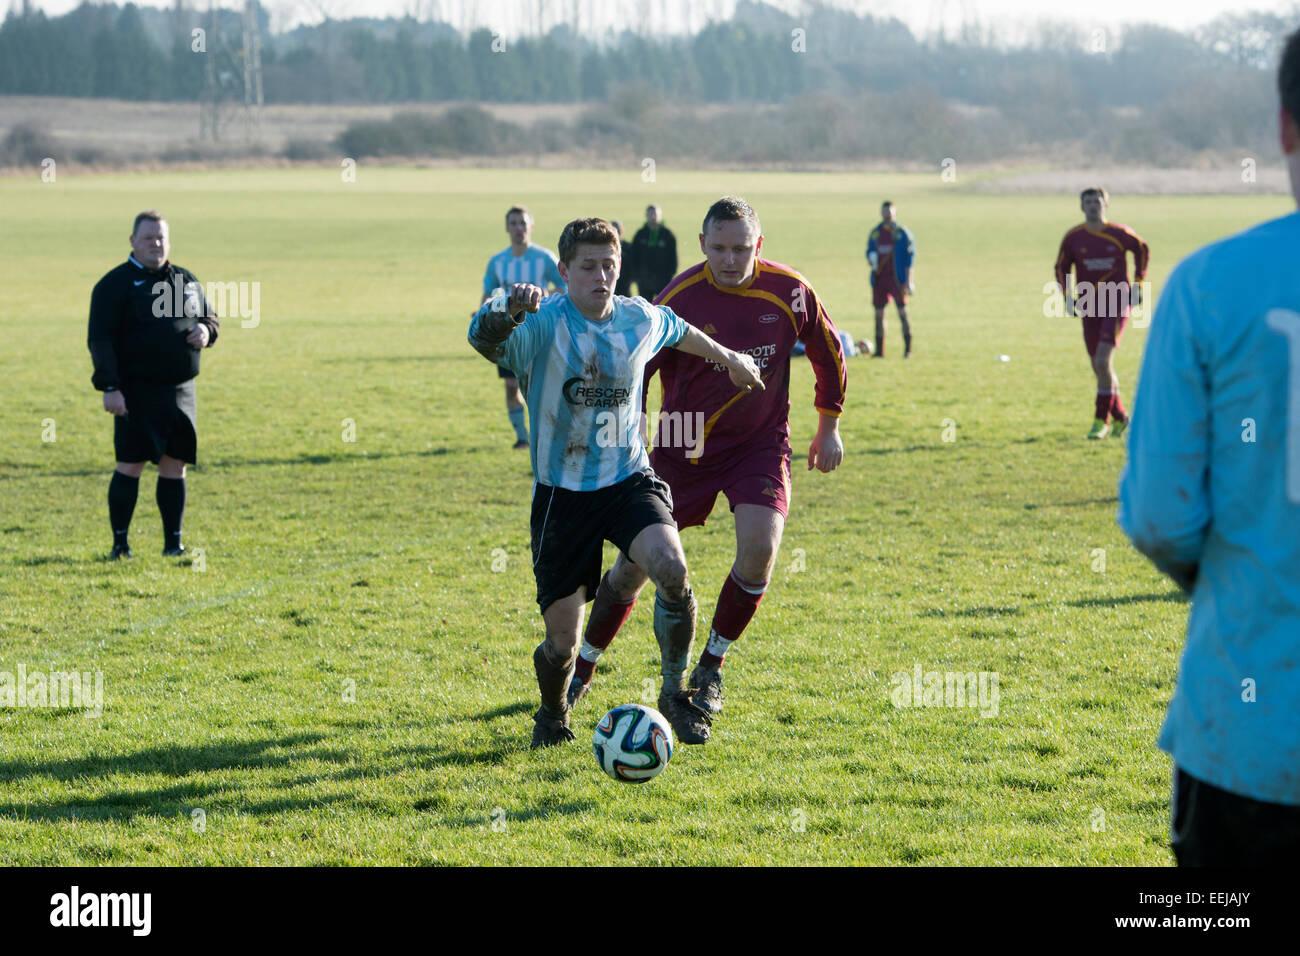 Sunday League football, Leamington Spa, Warwickshire, UK - Stock Image